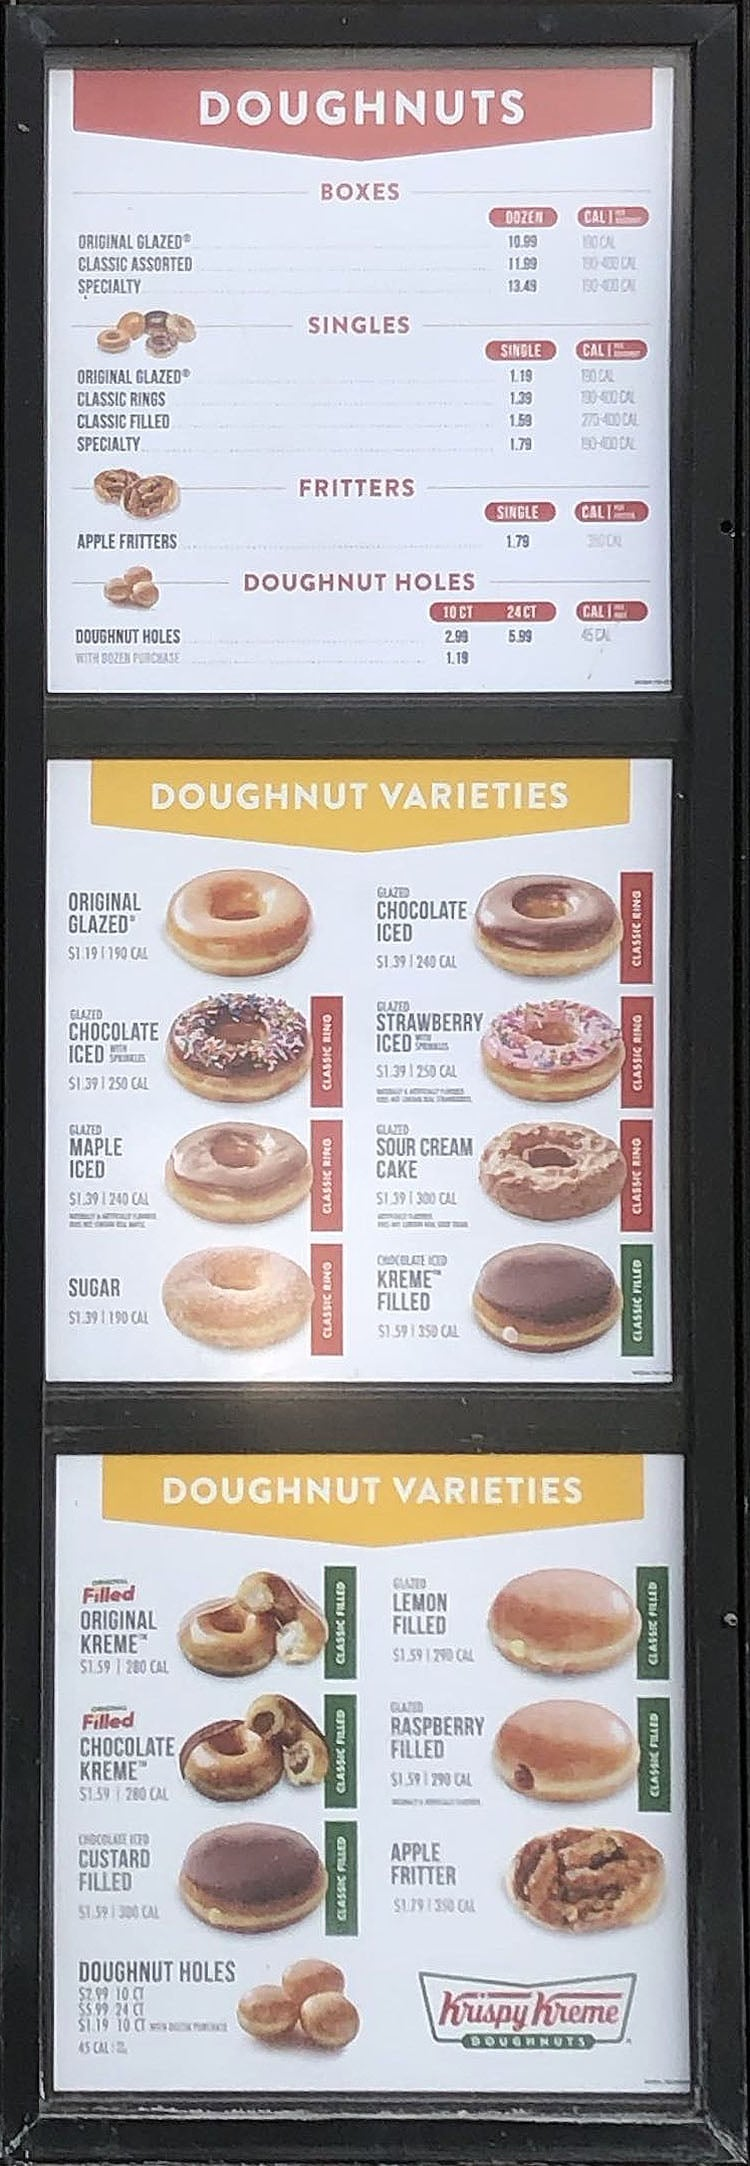 Krispy Kreme menu - doughnuts, doughnut varieties